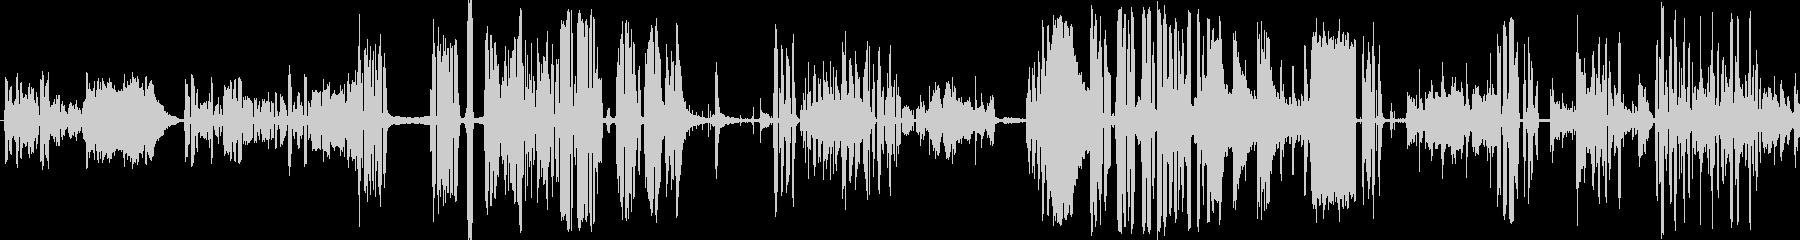 Murmur Voices Rad...の未再生の波形